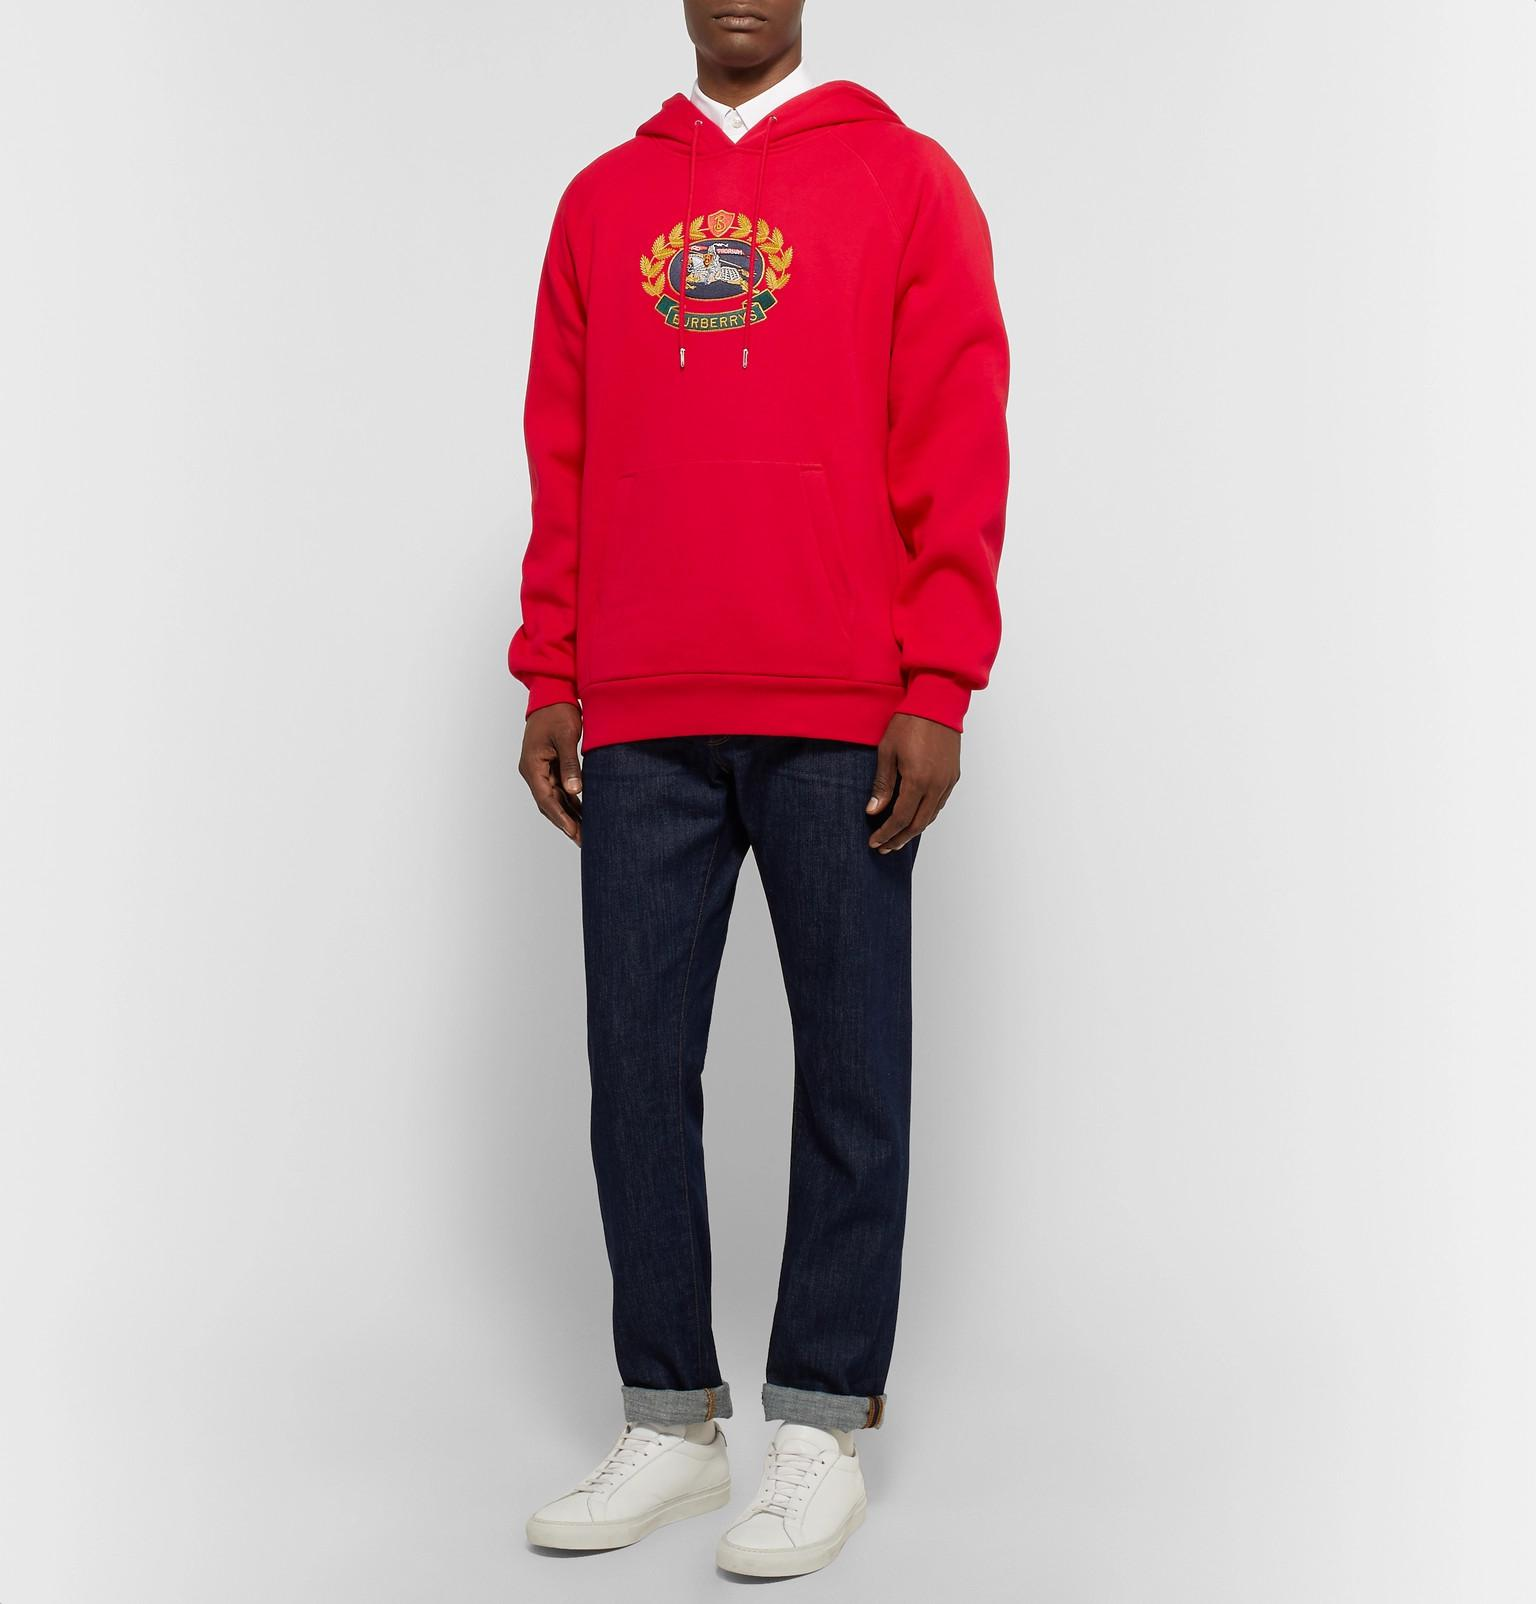 89ad3bde7469 Burberry - Logo-embroidered Fleece-back Cotton-blend Jersey Hoodie for Men  -. View fullscreen